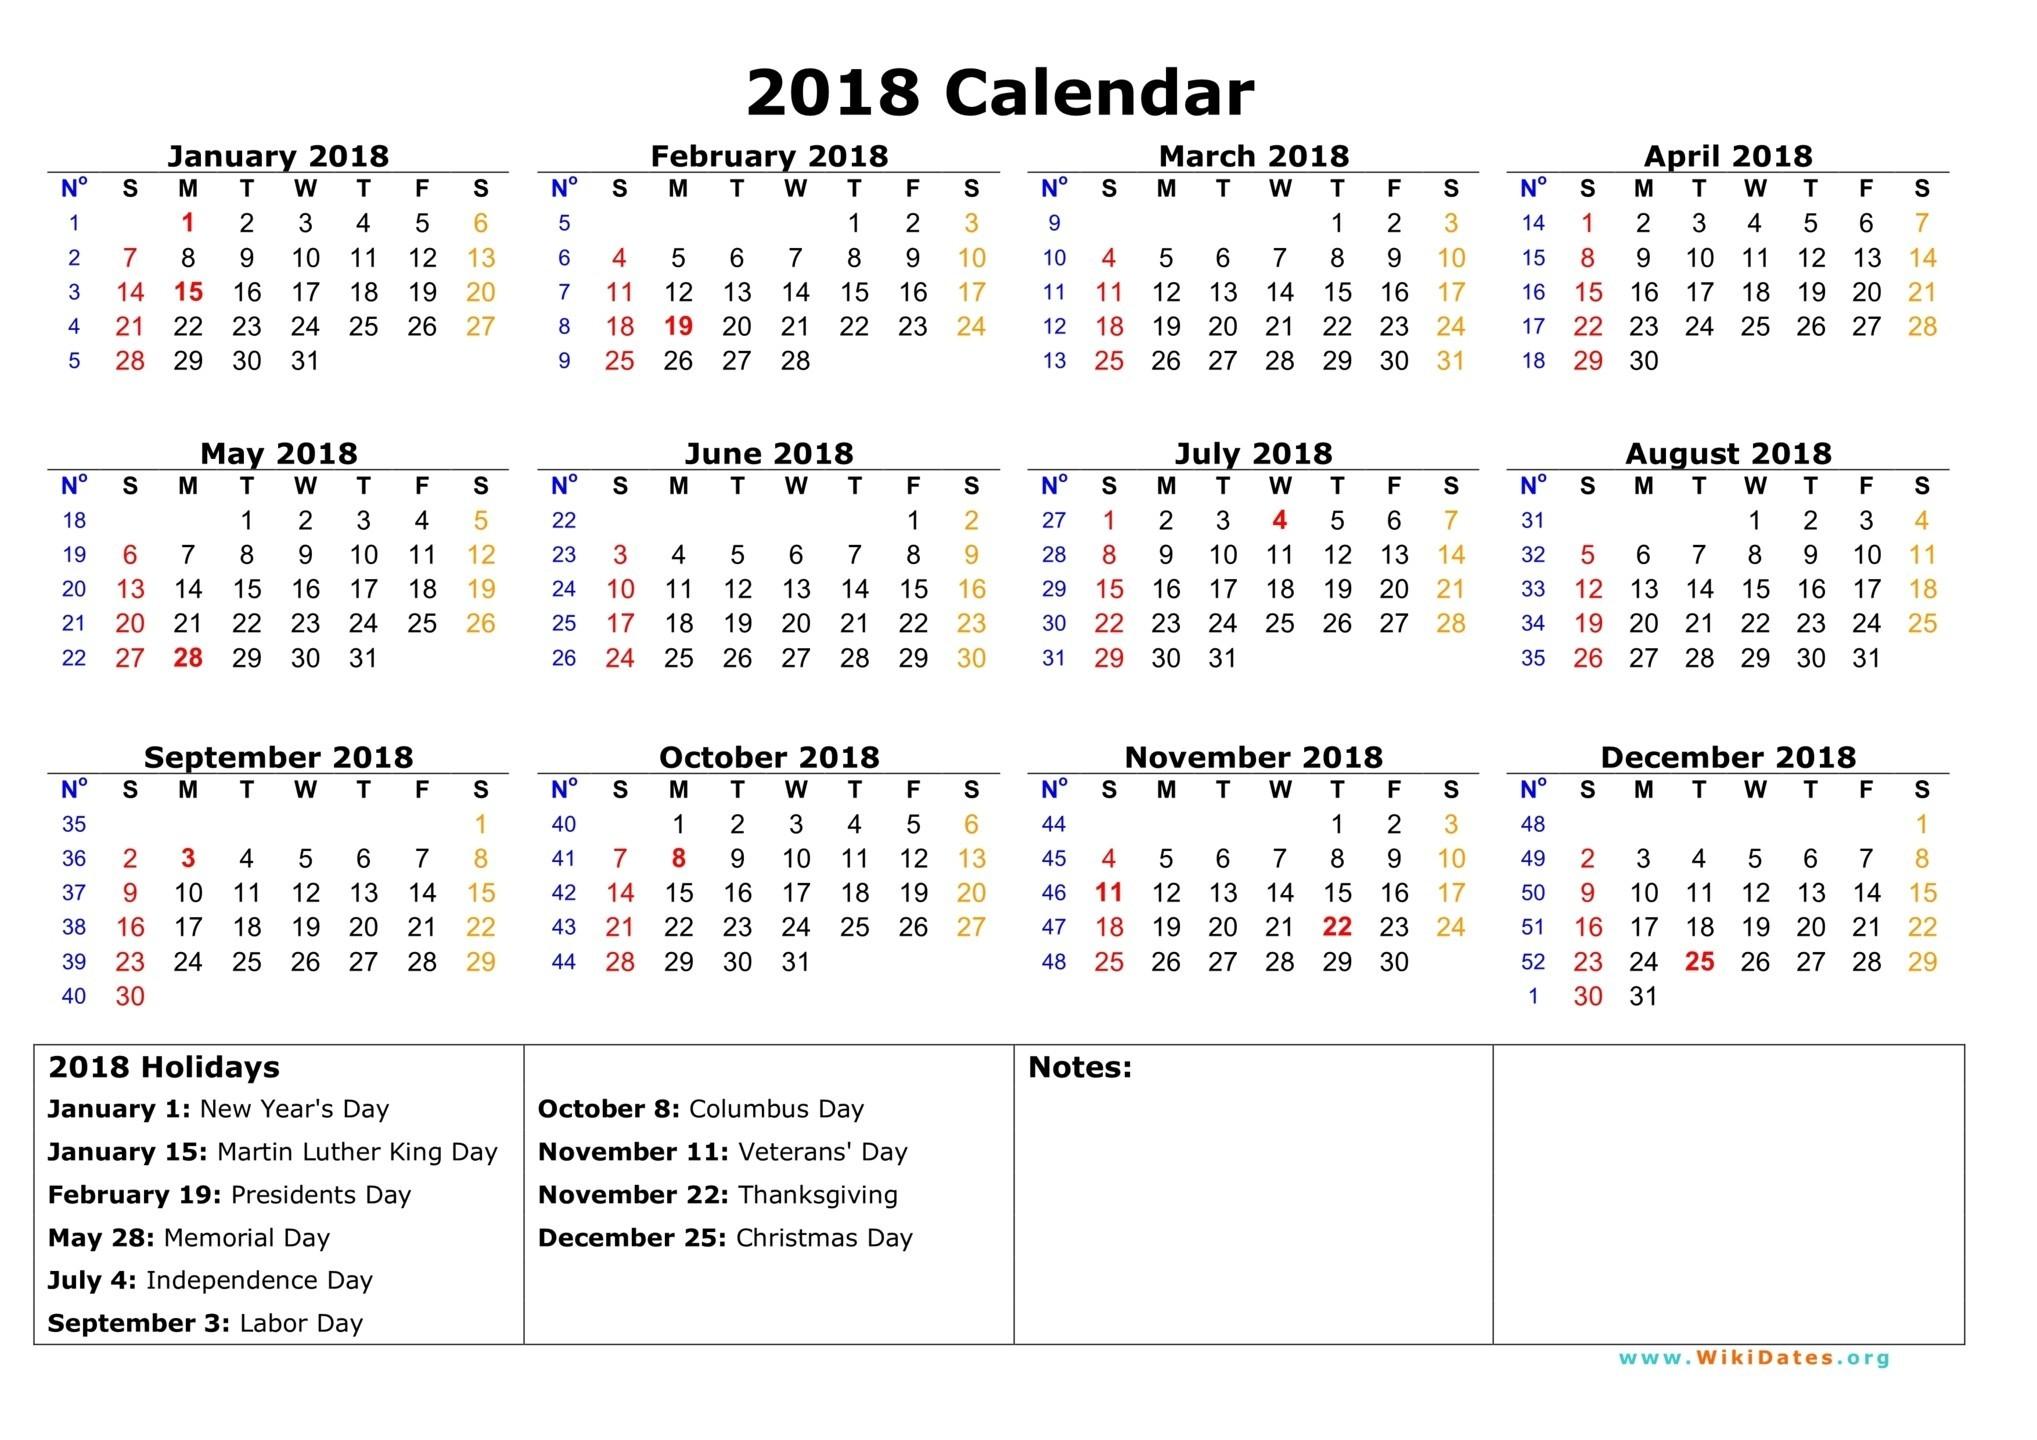 2018 Wallpaper Calendar (72+ images)